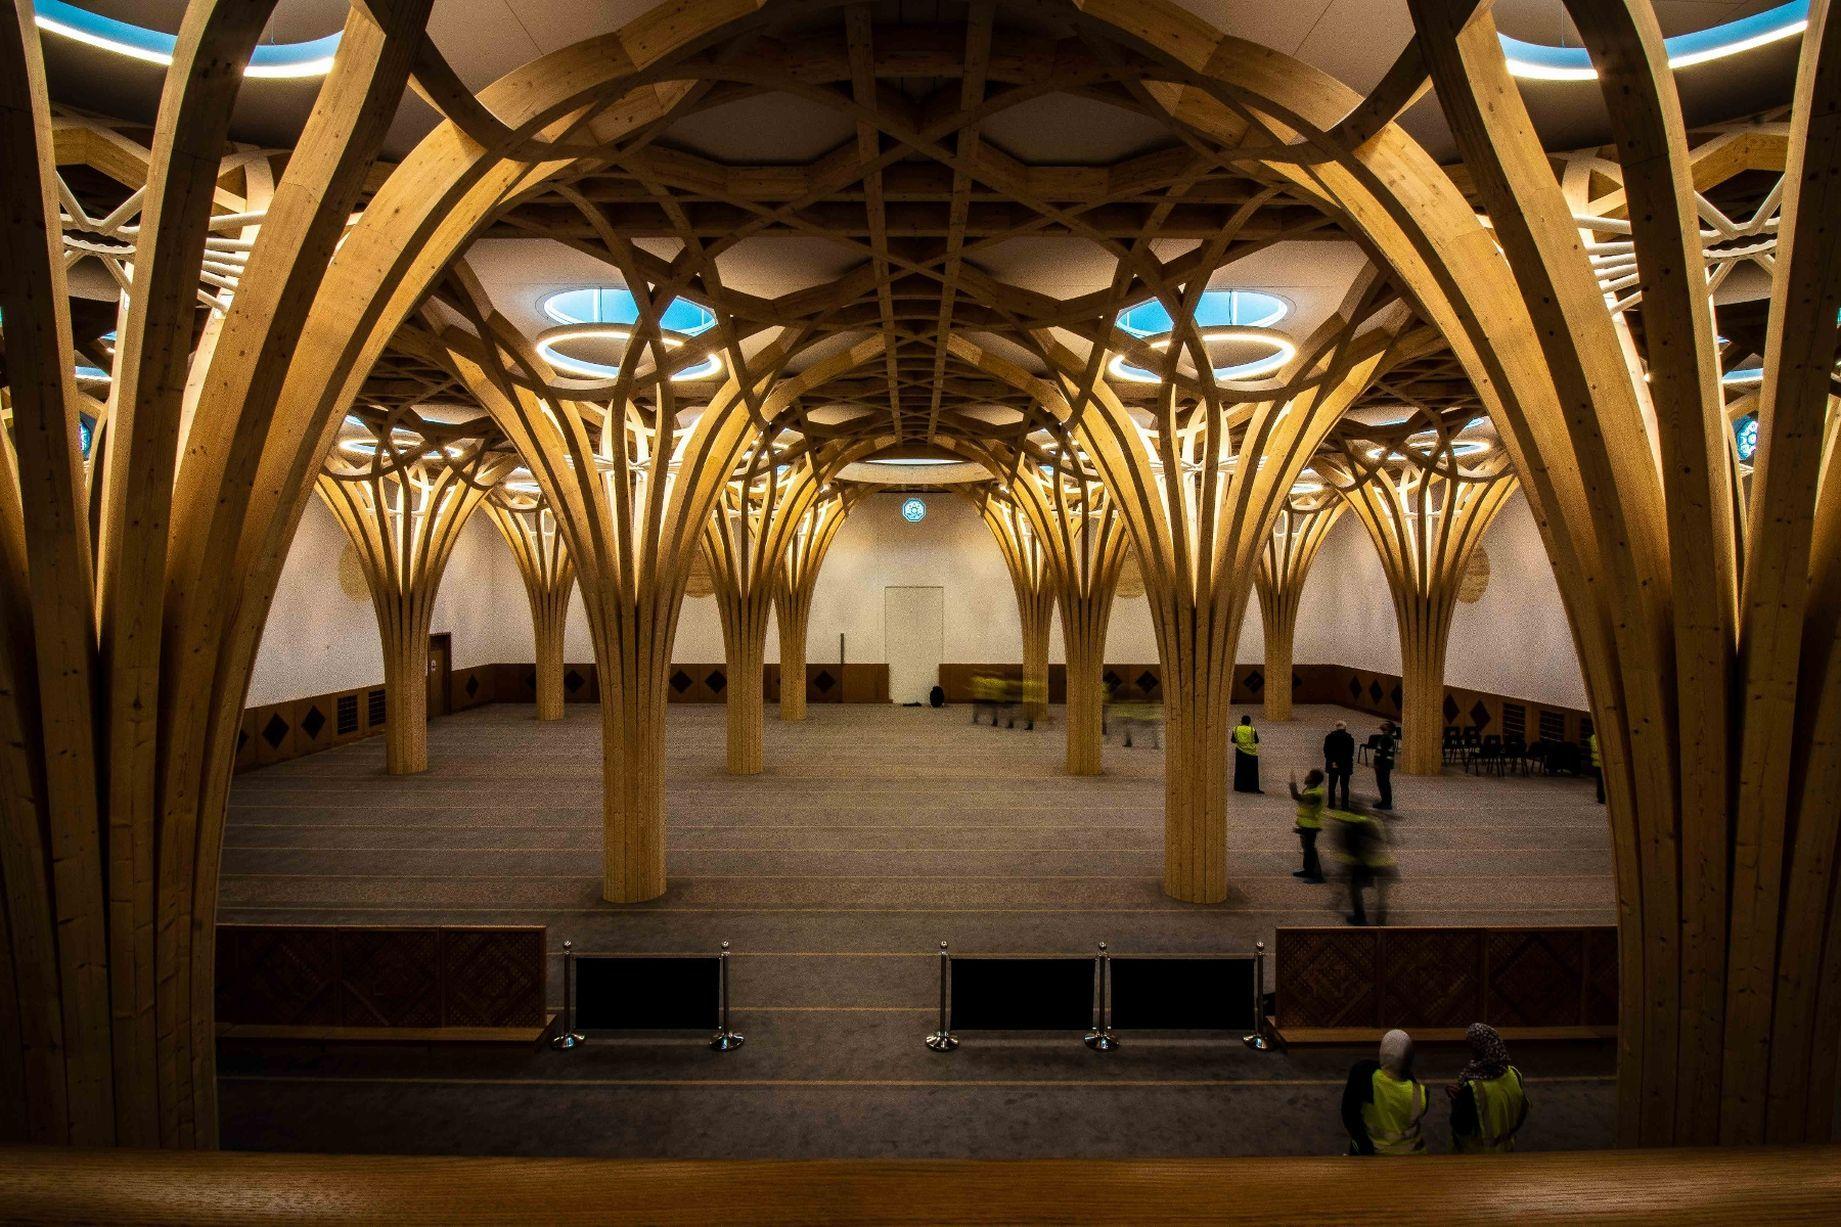 Cambridge Central Mosque, Surga Kecil di Tanah Inggris